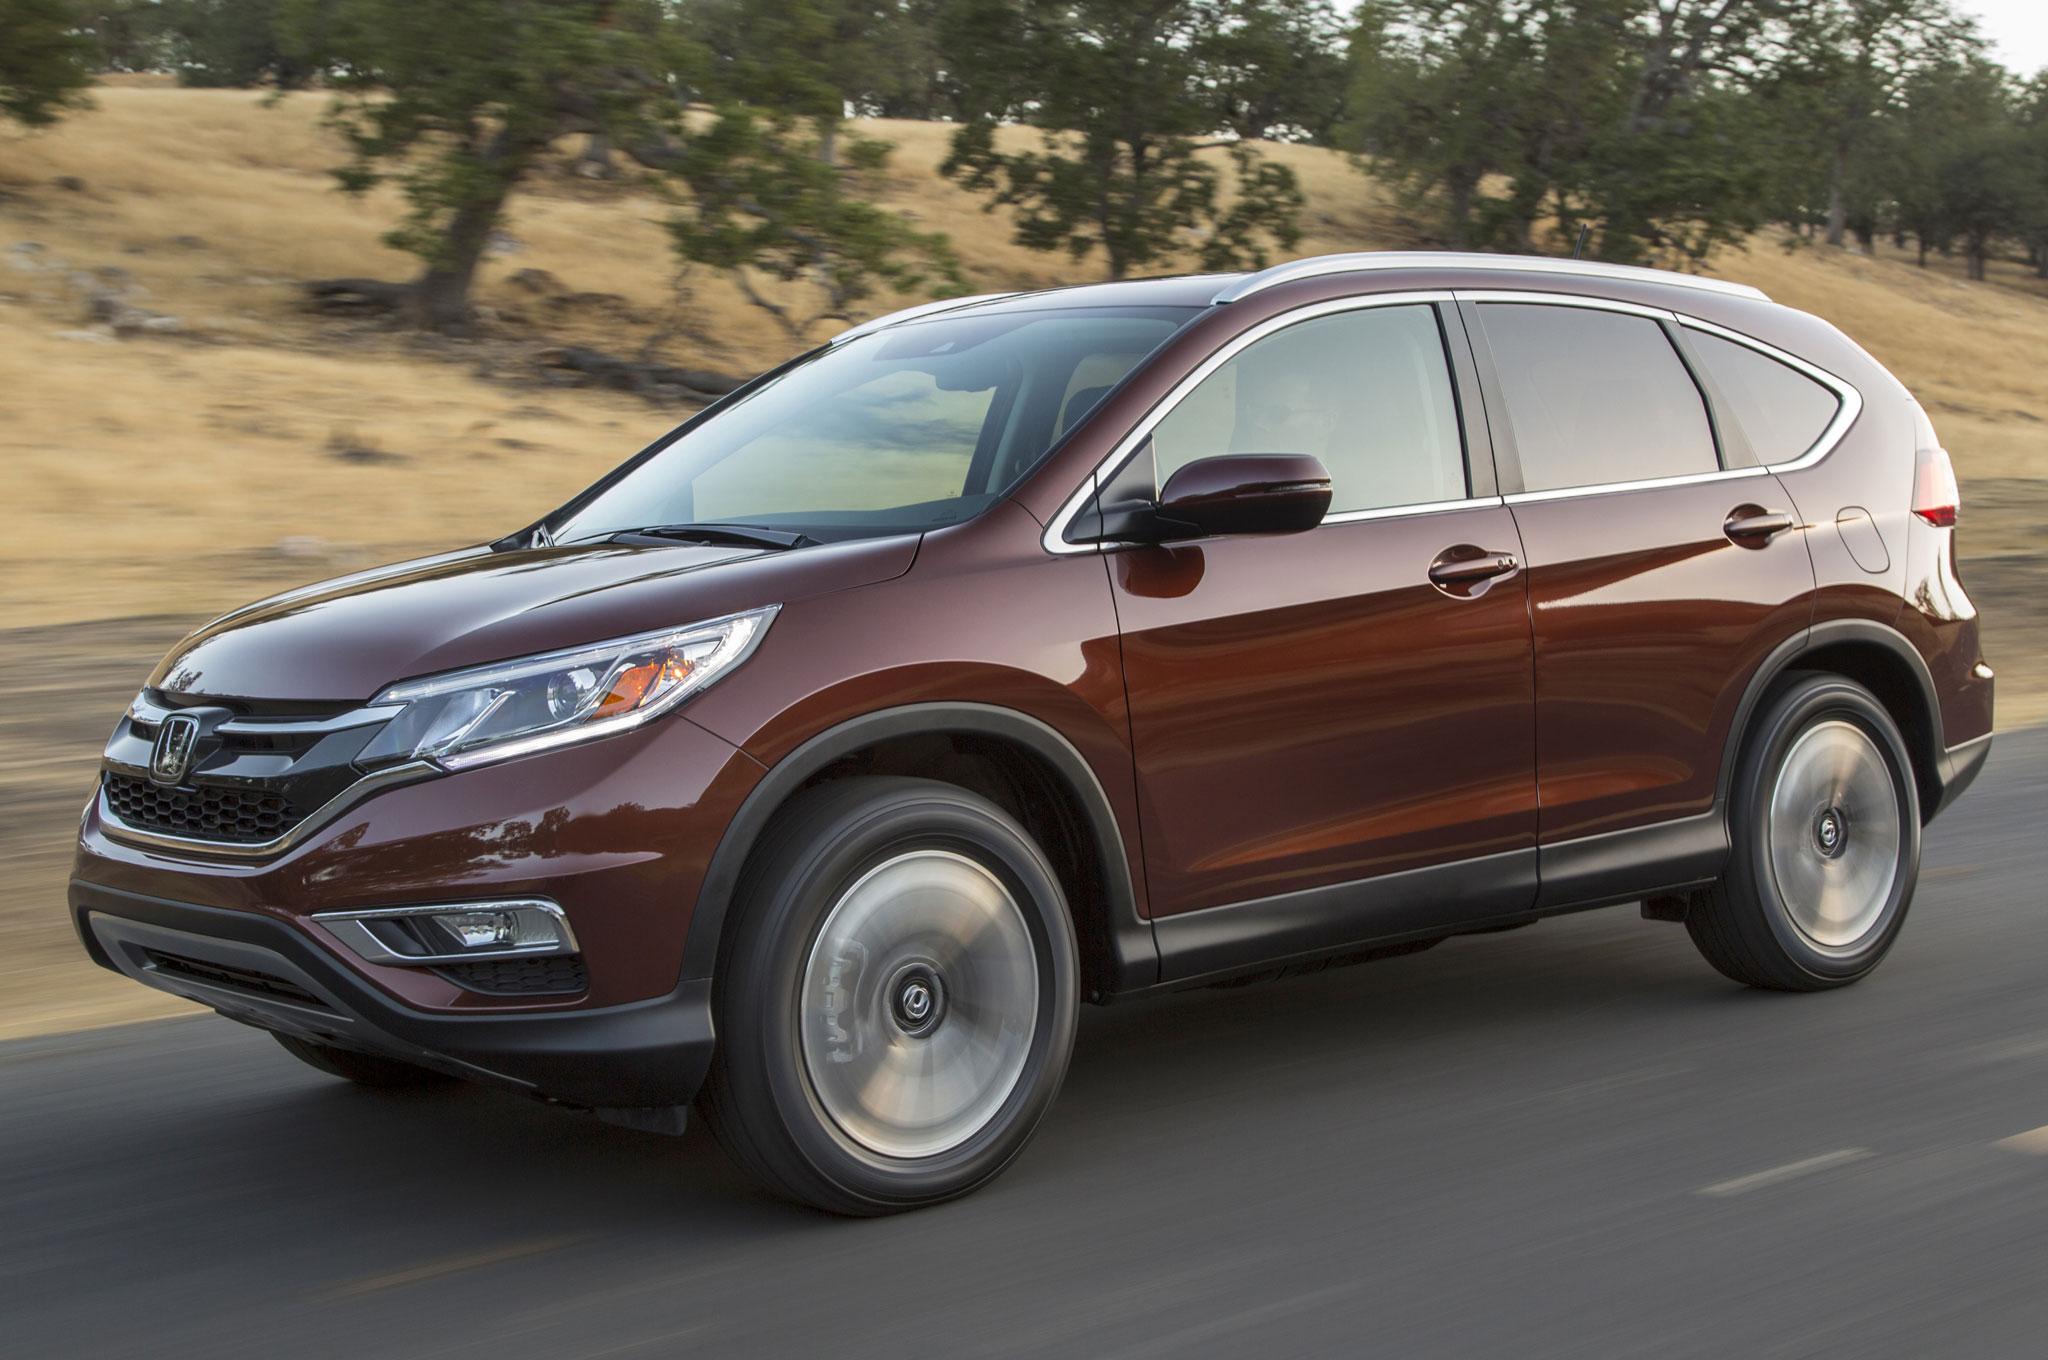 honda review cars cr suv crv tweaked v tech reviews